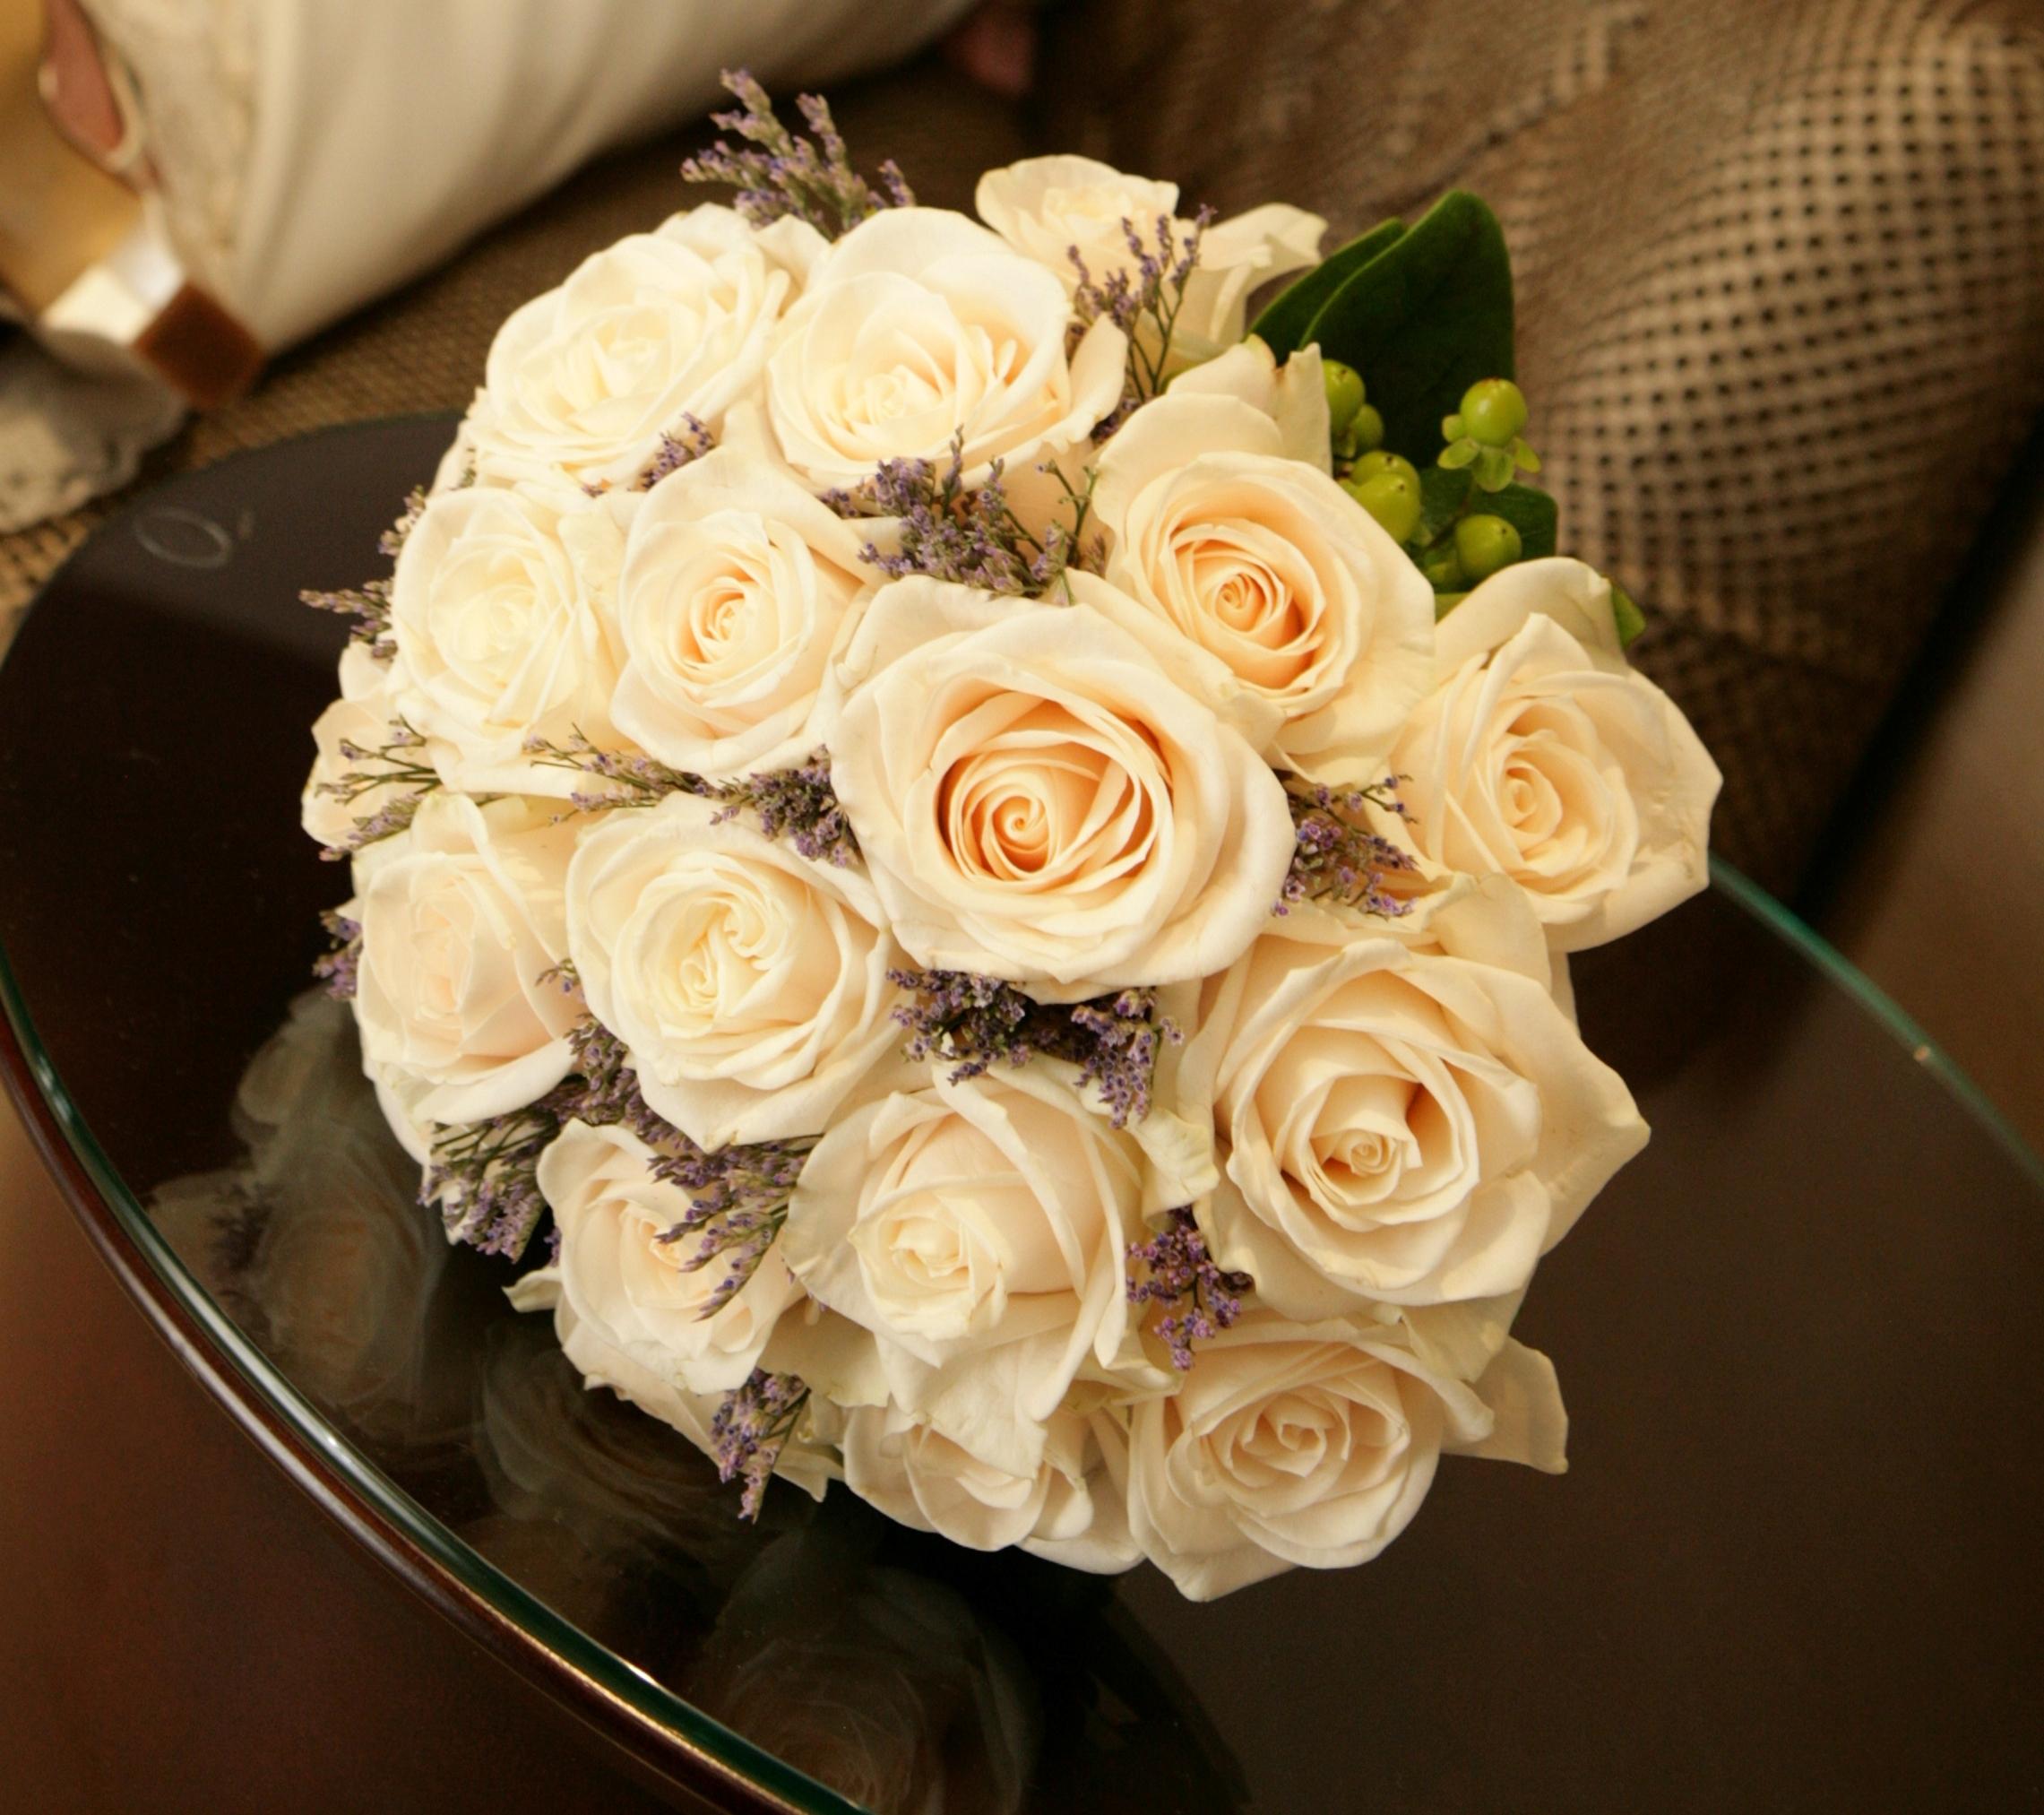 Flowers & Decor, Bridesmaids, Bridesmaids Dresses, Fashion, white, purple, Bride Bouquets, Bridesmaid Bouquets, Flowers, Roses, Bouquet, Bridal, Hand, Tied, Monday morning flowers, Flower Wedding Dresses